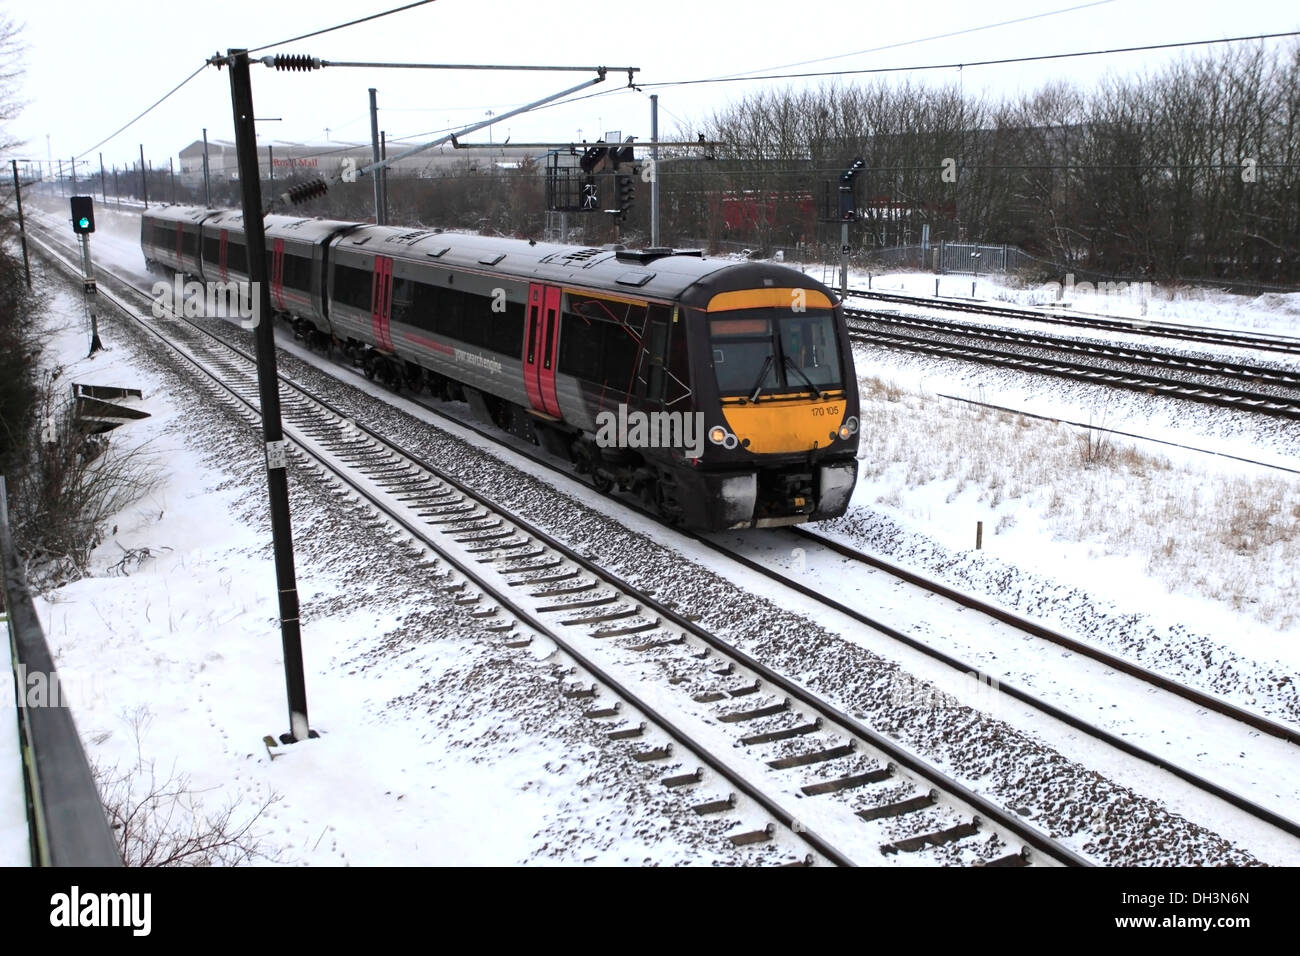 Snow, 170105 County 2 County trains, Turbostar class, High Speed Diesel Train, East Coast Main Line Railway, Cambridgeshire - Stock Image